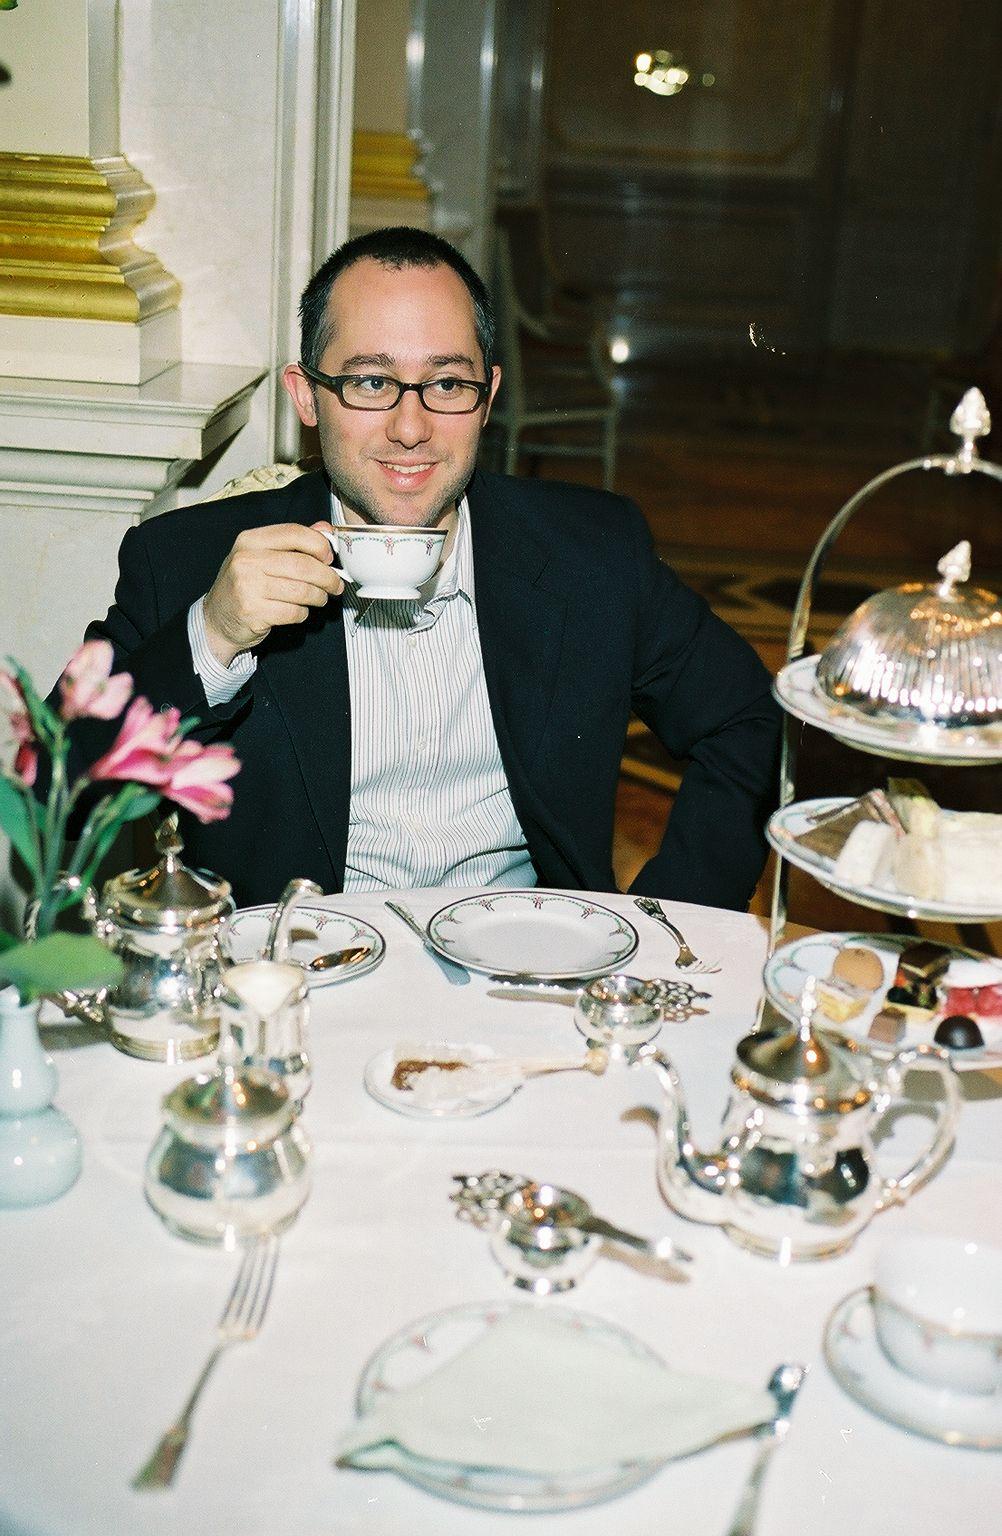 Having Tea at the St. Regis